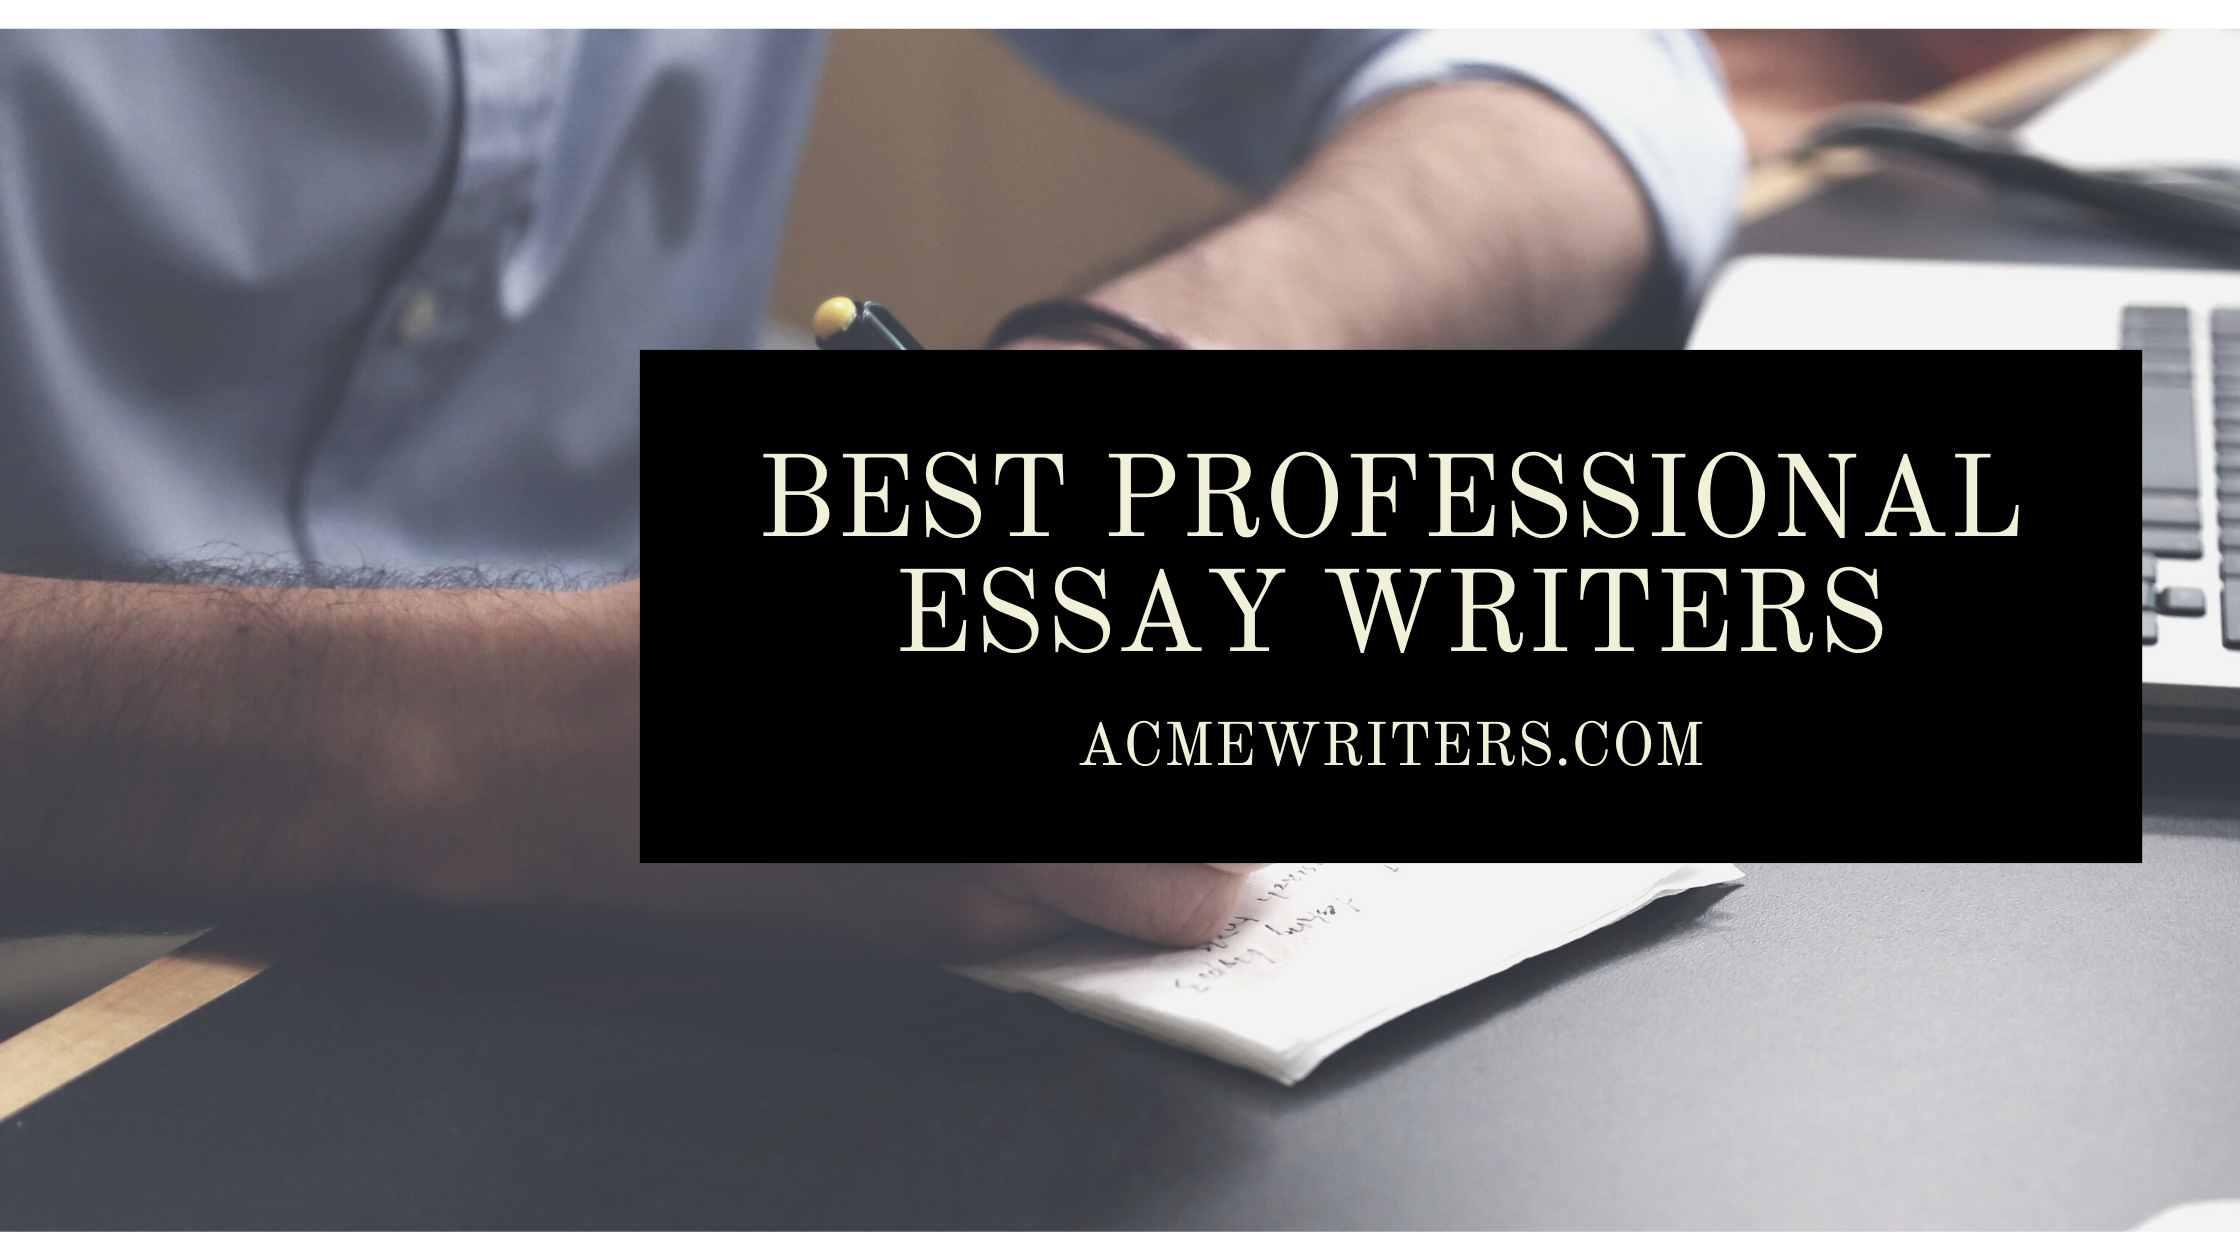 Best Professional Essay Writers